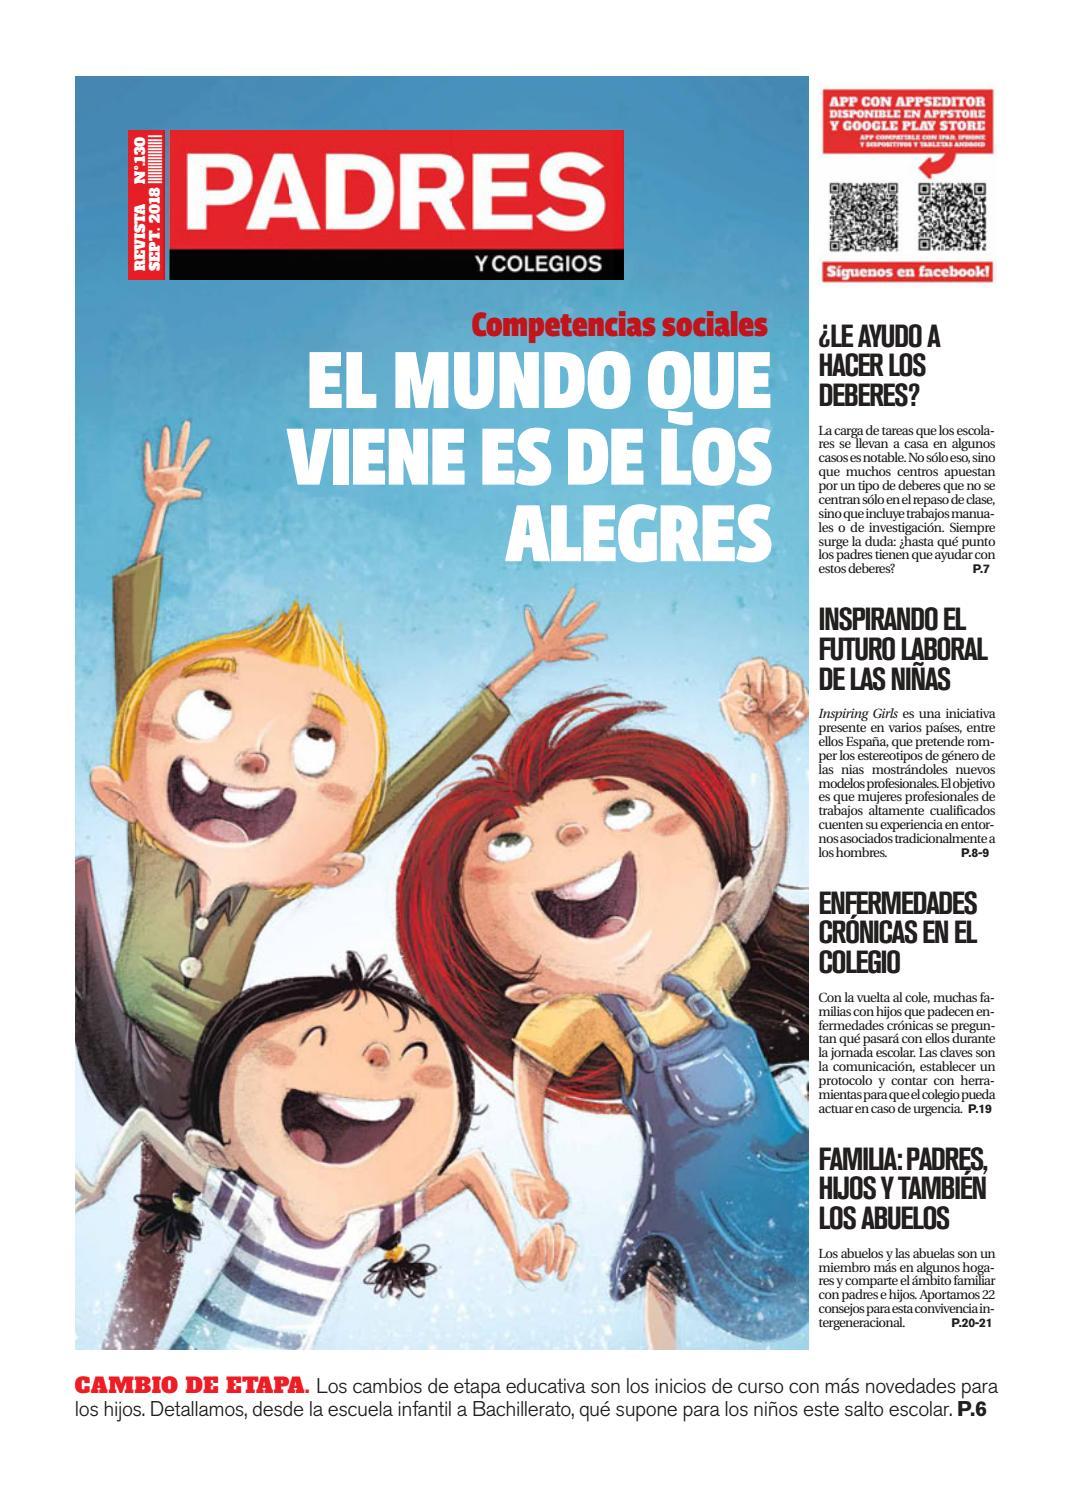 130 Y Septiembre 2018 Nº Padres Colegios tdxCBhsQr